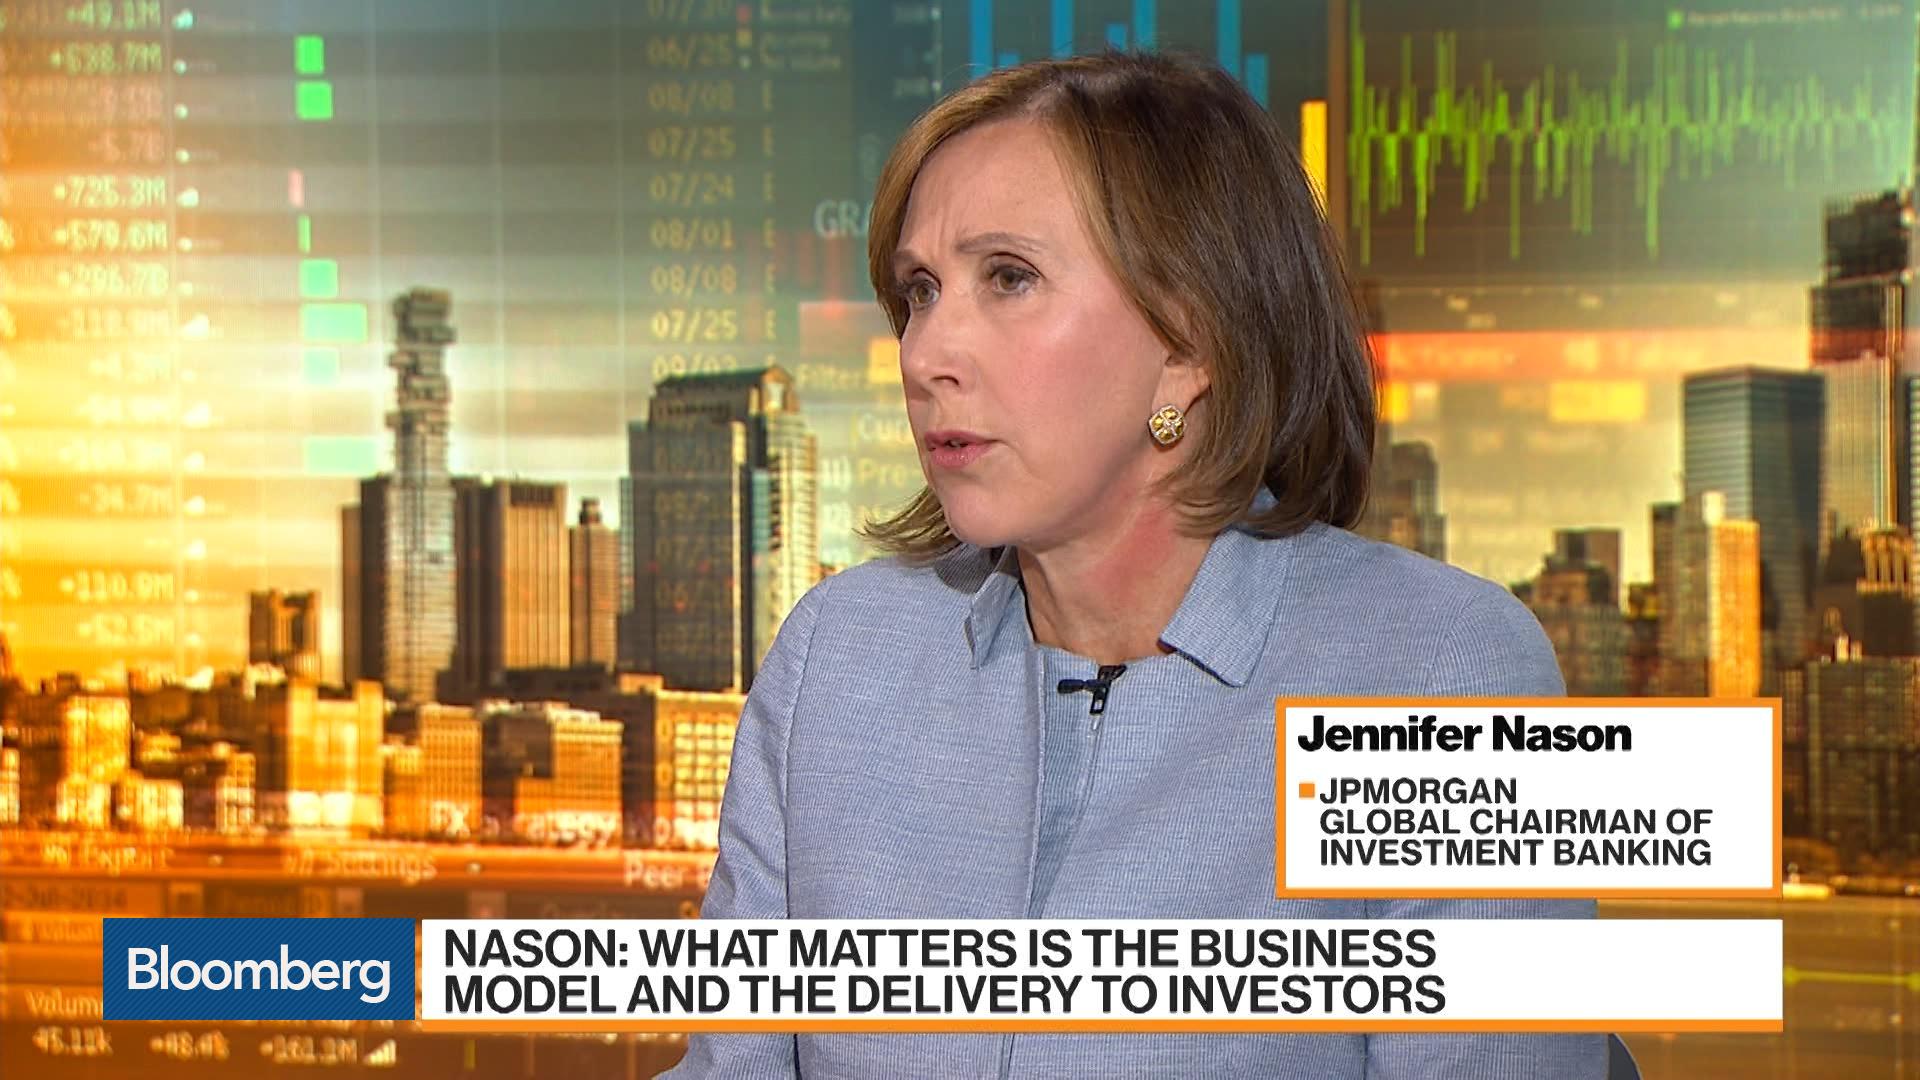 IPO Market Going Through a Value Reset, JPMorgan's Nason Says